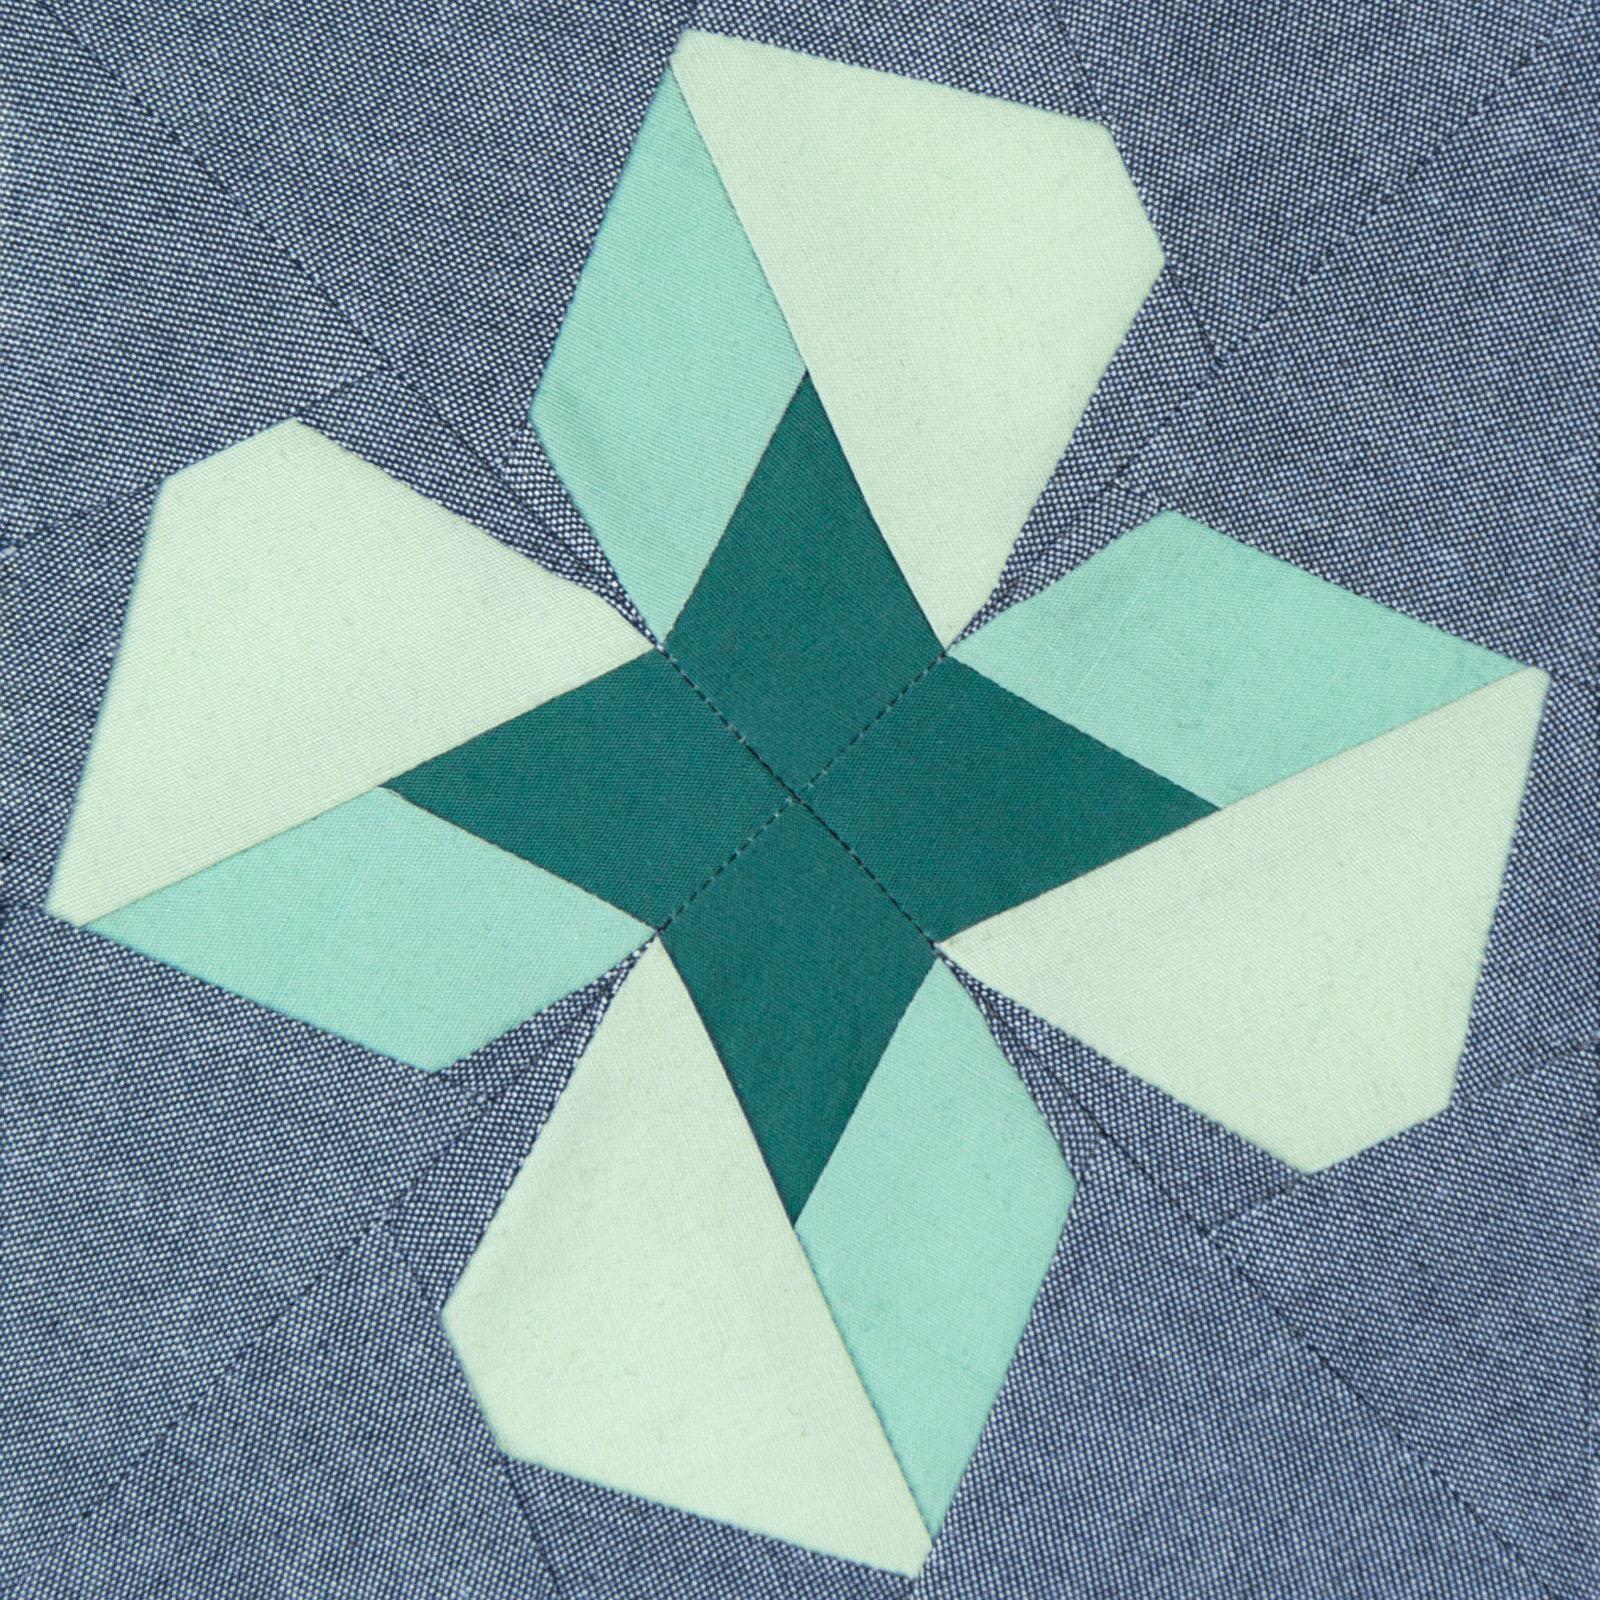 Lodestars quilt block #15: Pearl